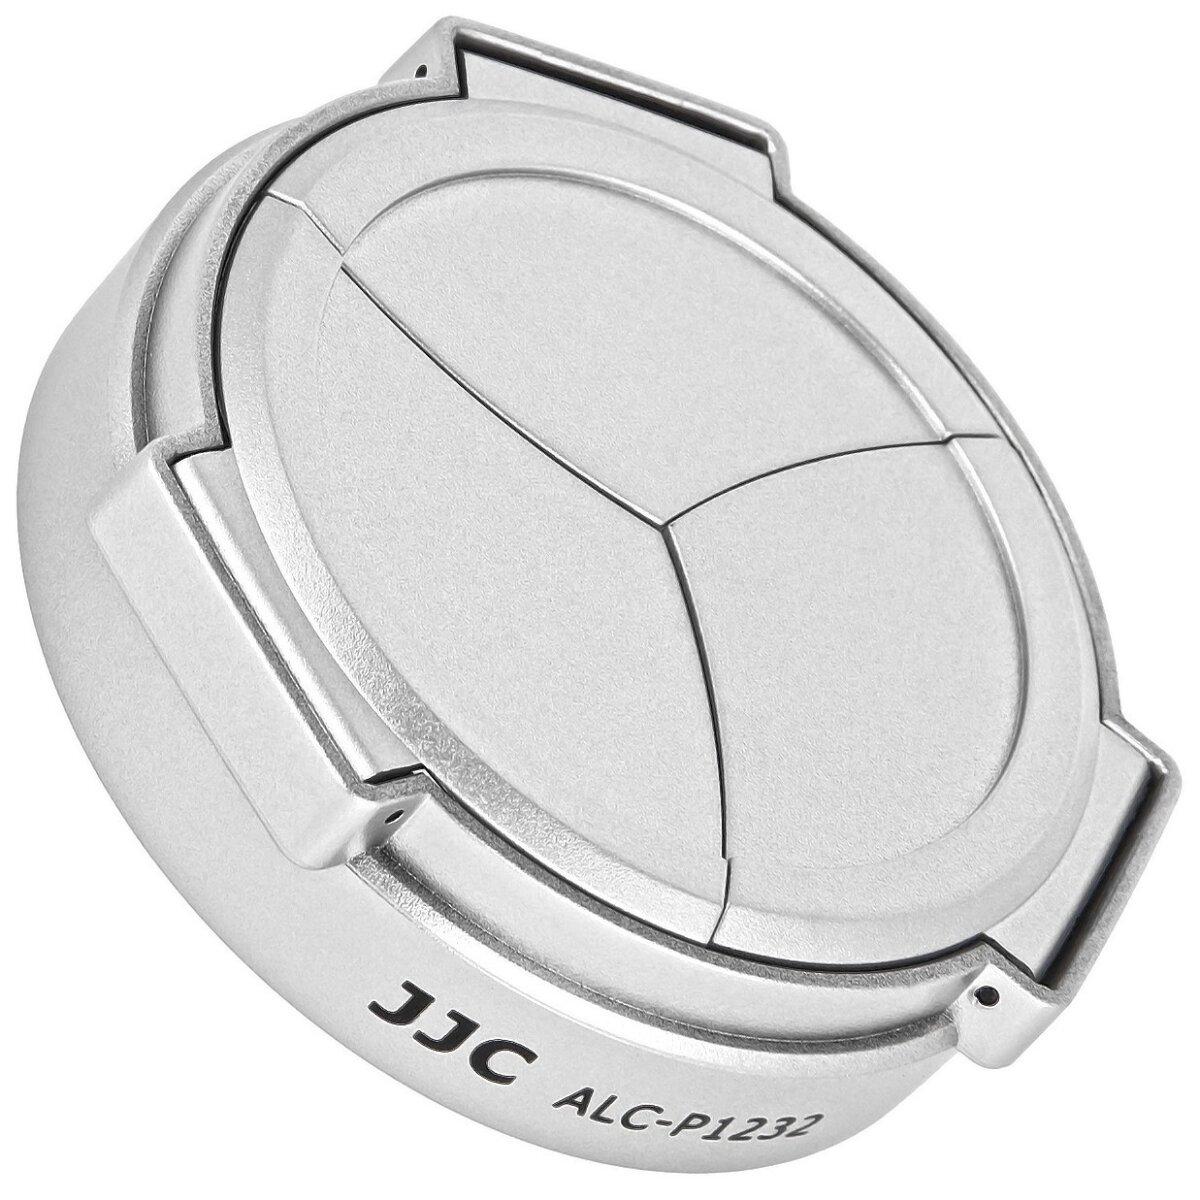 JJC Automatik Objektivdeckel, Frontdeckel fuer Panasonic H-FS12032 - ALC-P1232 SILVER